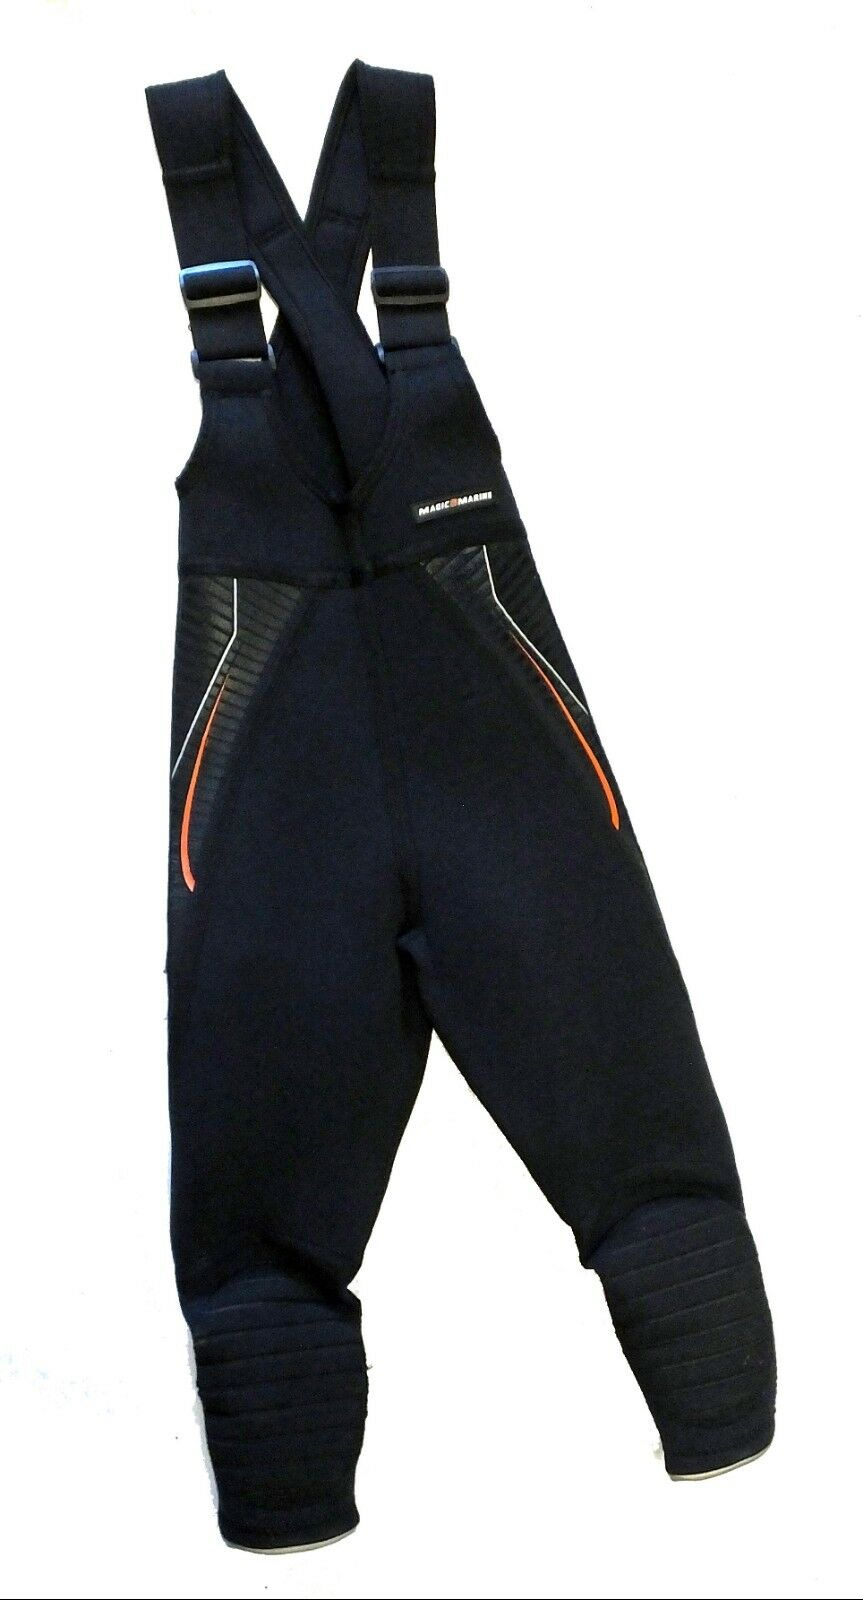 Magic Marine Dinghy Energy Hiking Pant with Knee -Junior Medium (Age 10 approx)